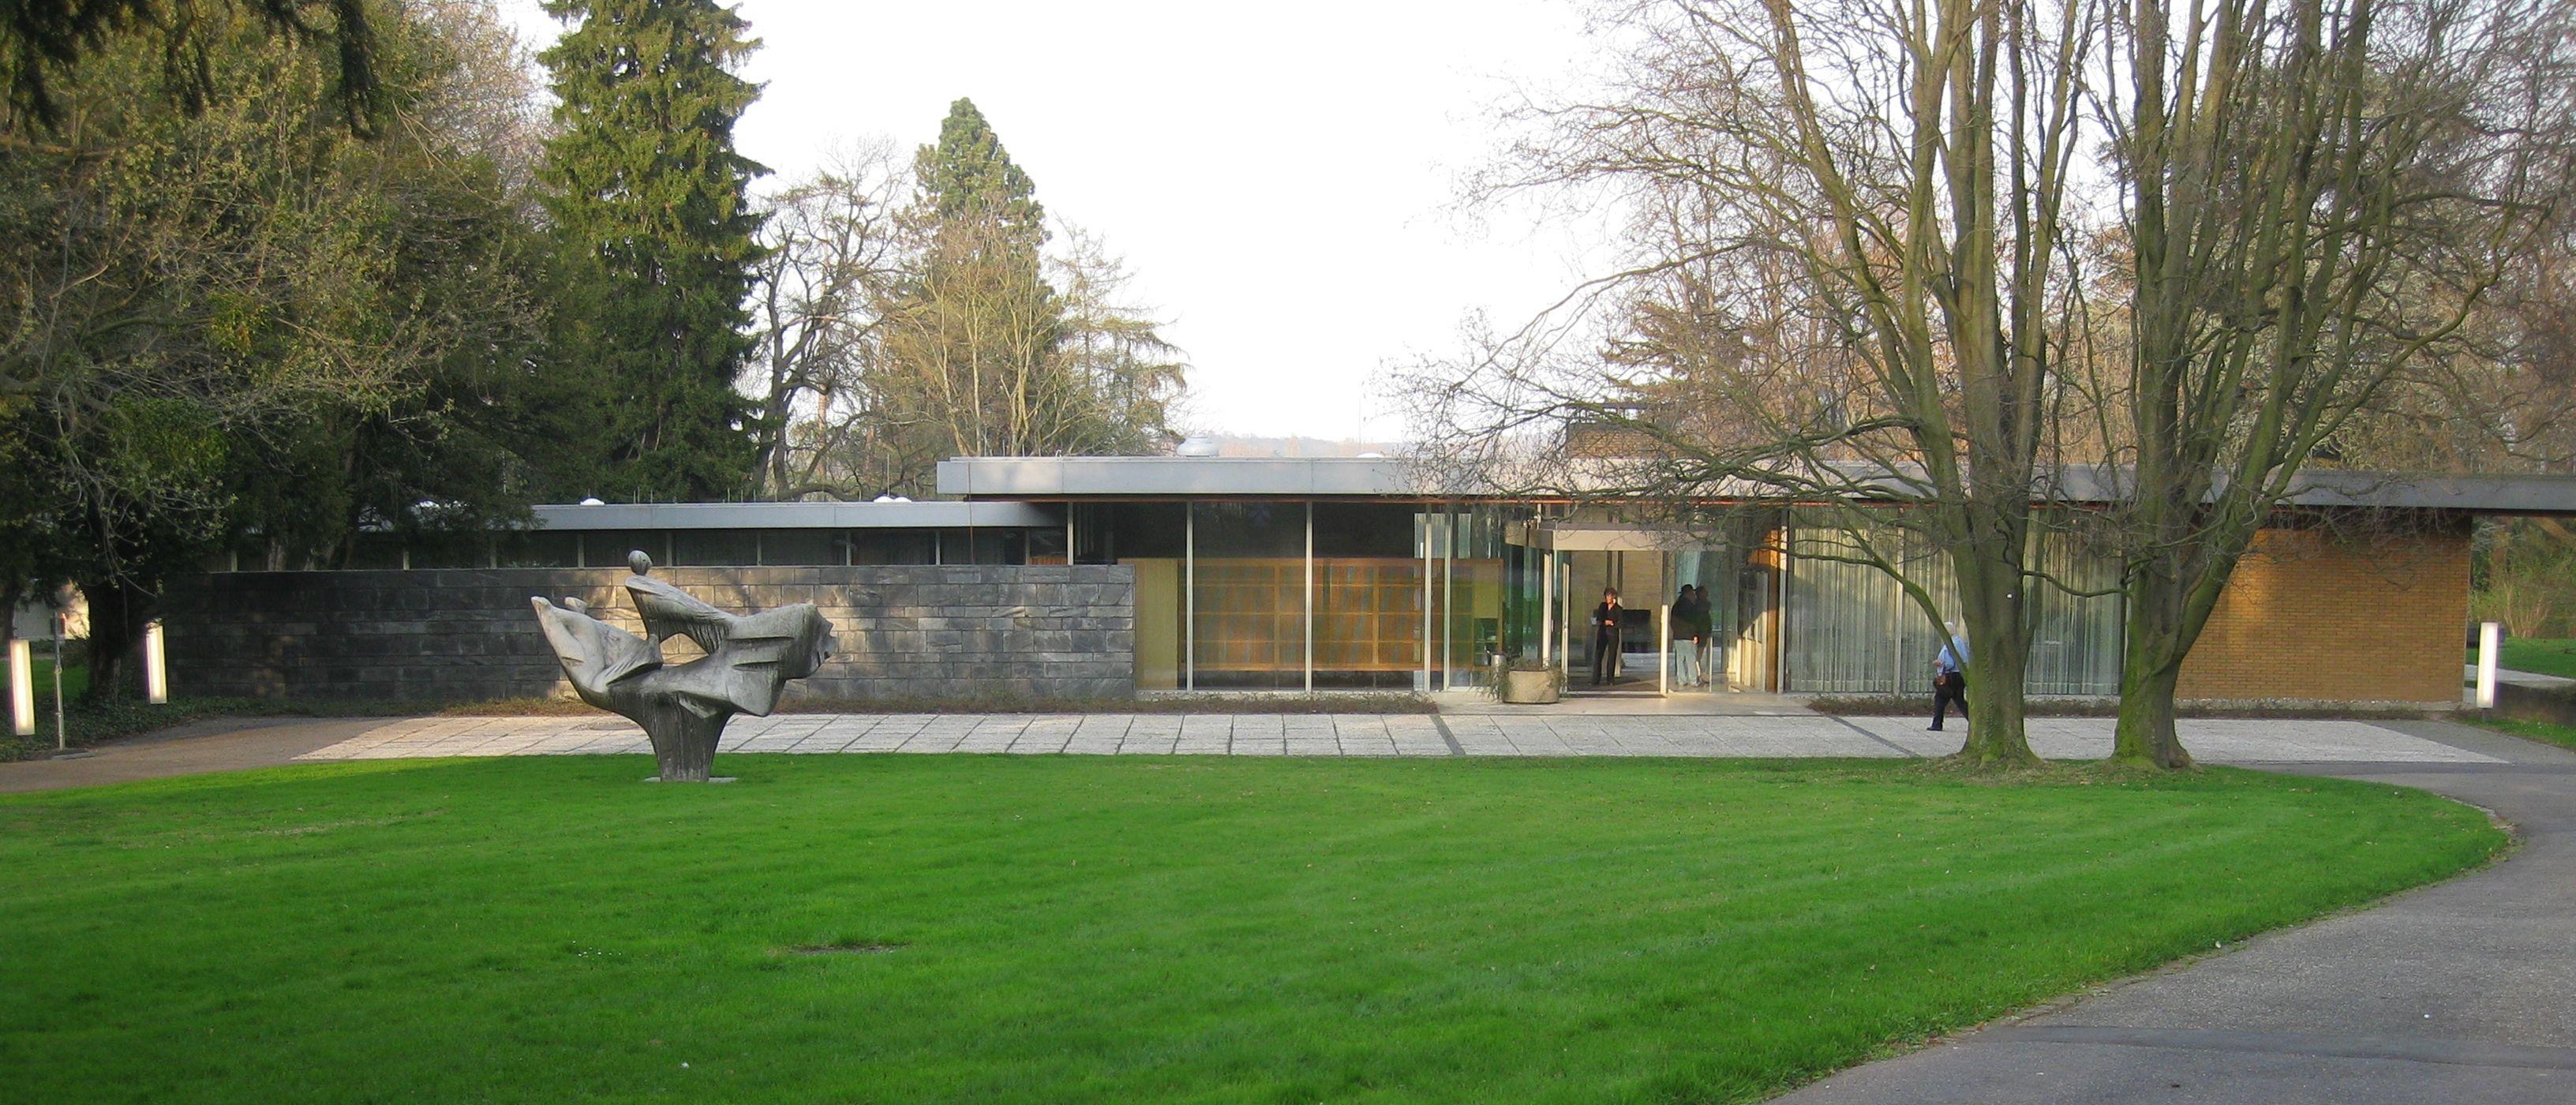 2012 03 27 Bonn Kanzlerbungalow Jpg 3264 1400 Mid Century Modern Exterior Modern Exterior Bonn